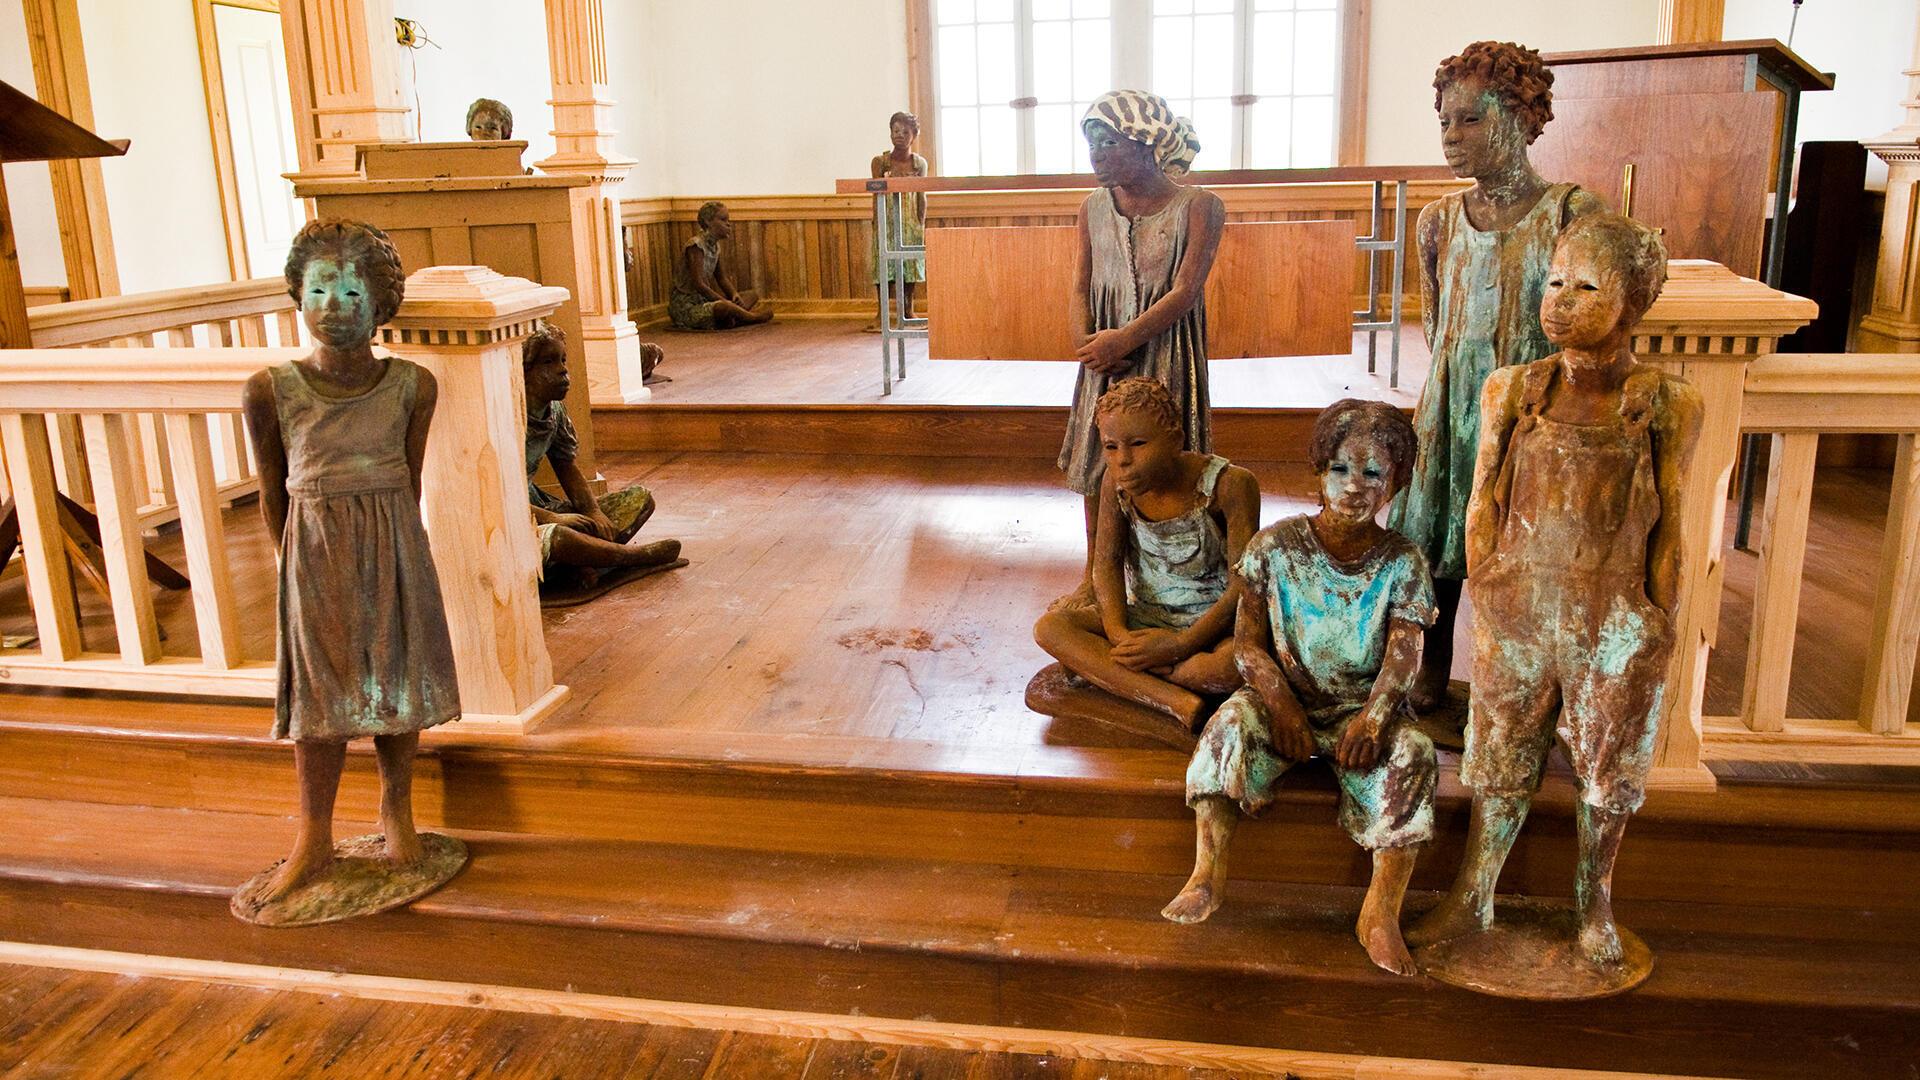 Etats-Unis - Whitney Plantation - Louisiane - esclaves - Si loin si proche